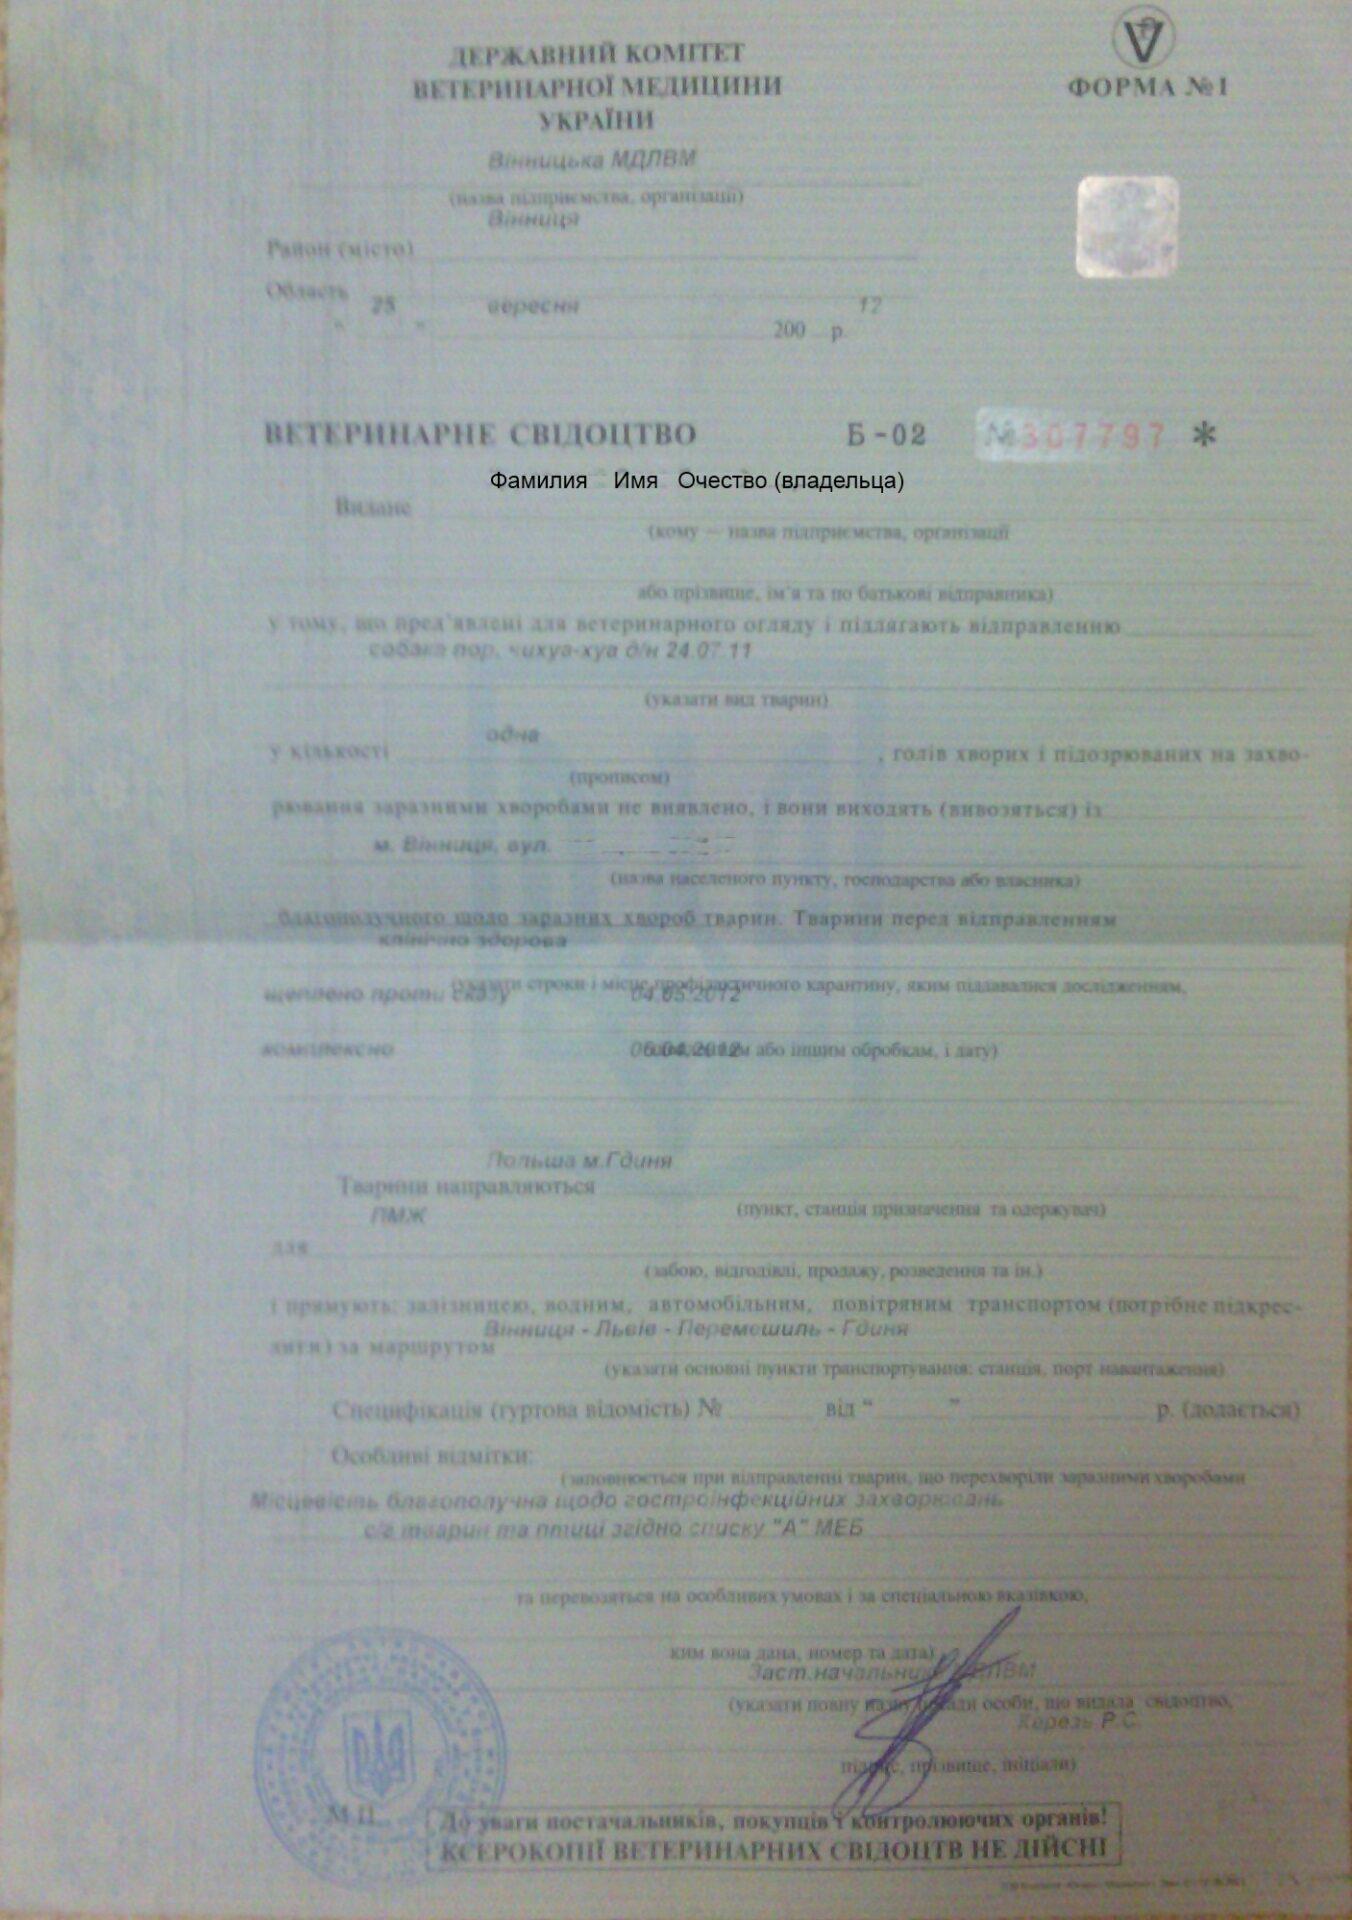 Ввоз собак за границу правила, документы, справки